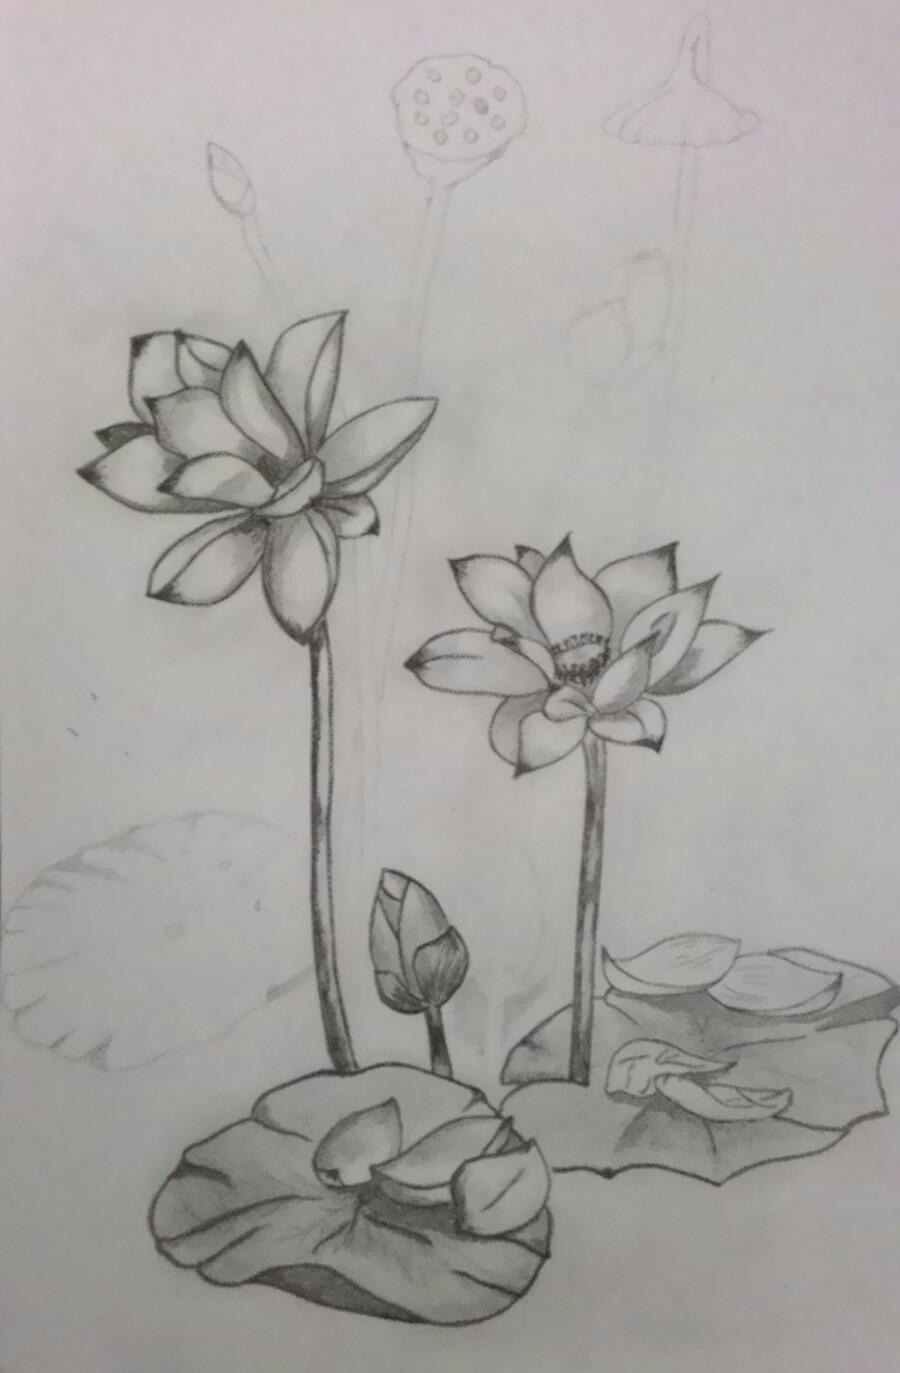 Gambar Bunga Teratai Hitam Putih Pickini